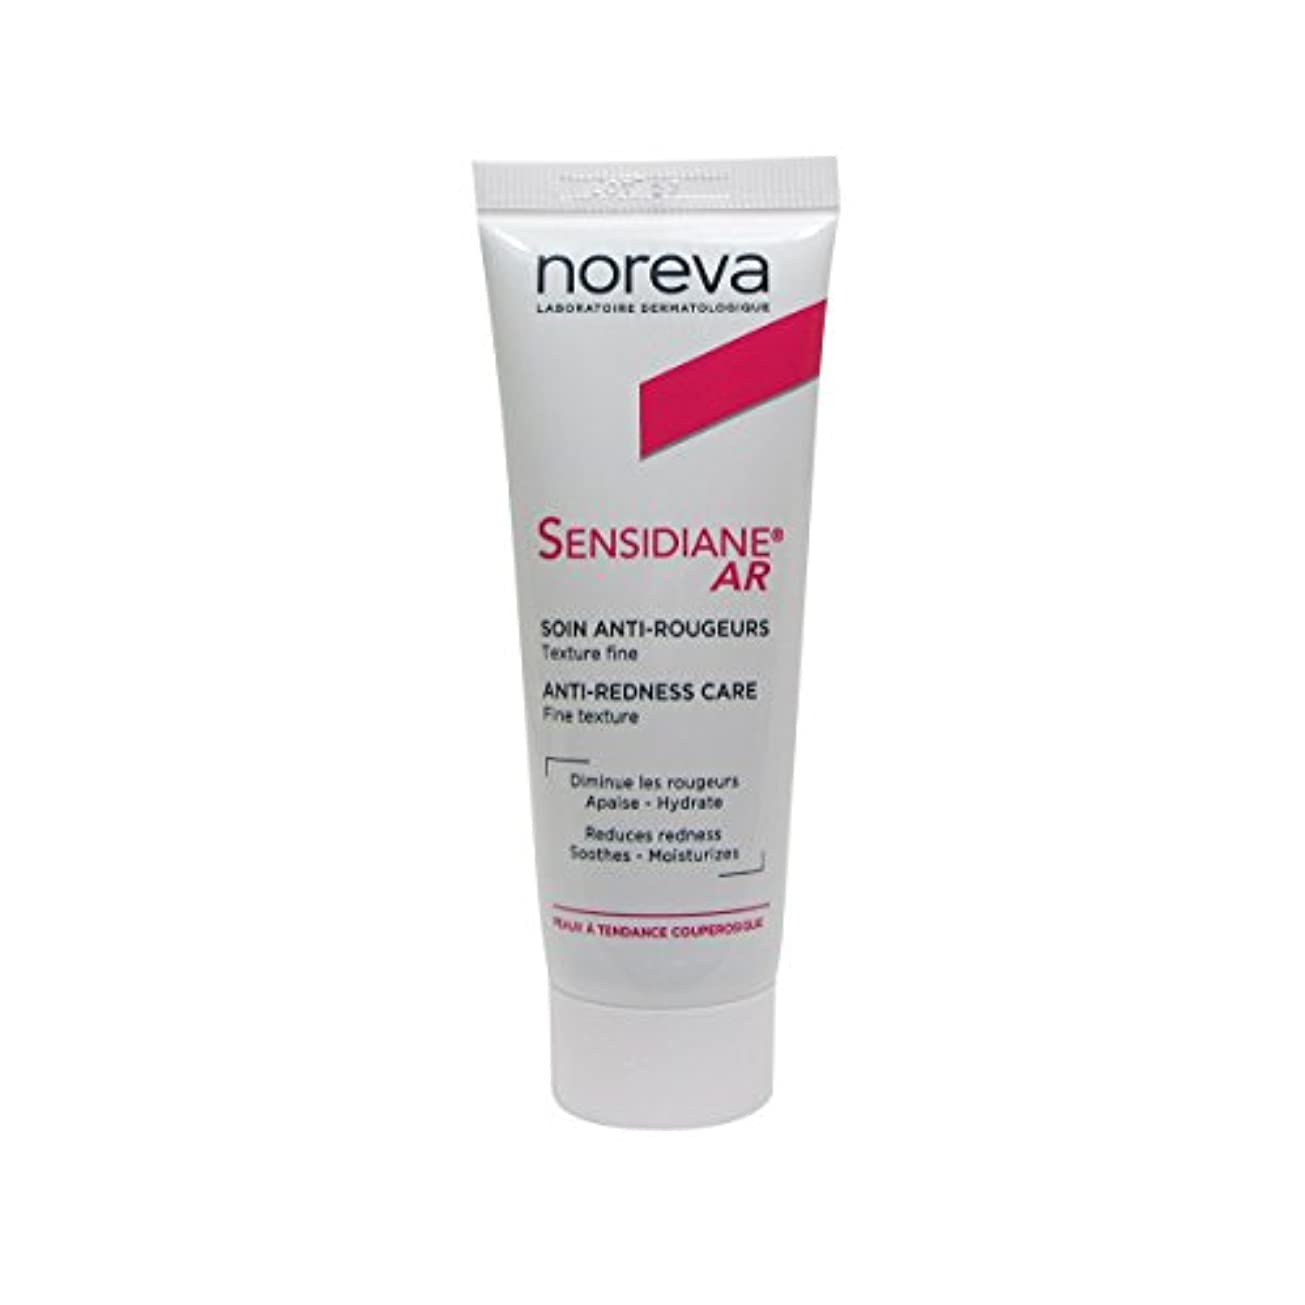 Noreva Sensidiane Ar Concentrated Anti Redness 30ml [並行輸入品]